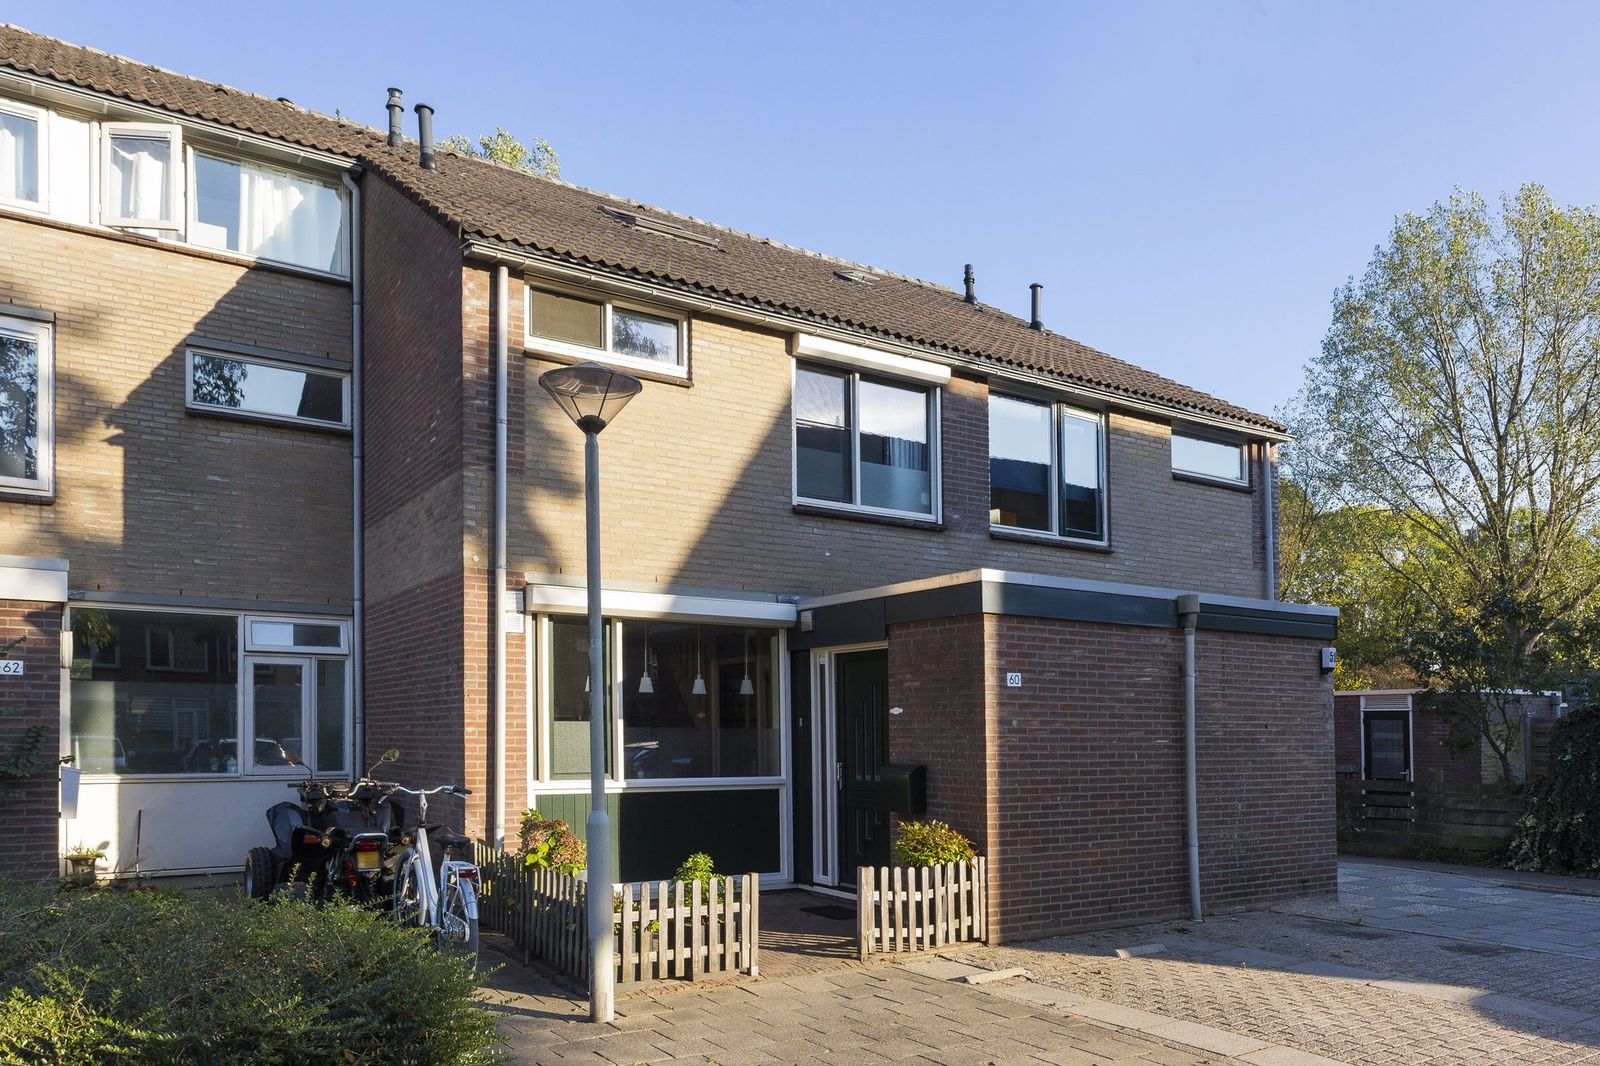 Helmondstraat 60, Arnhem